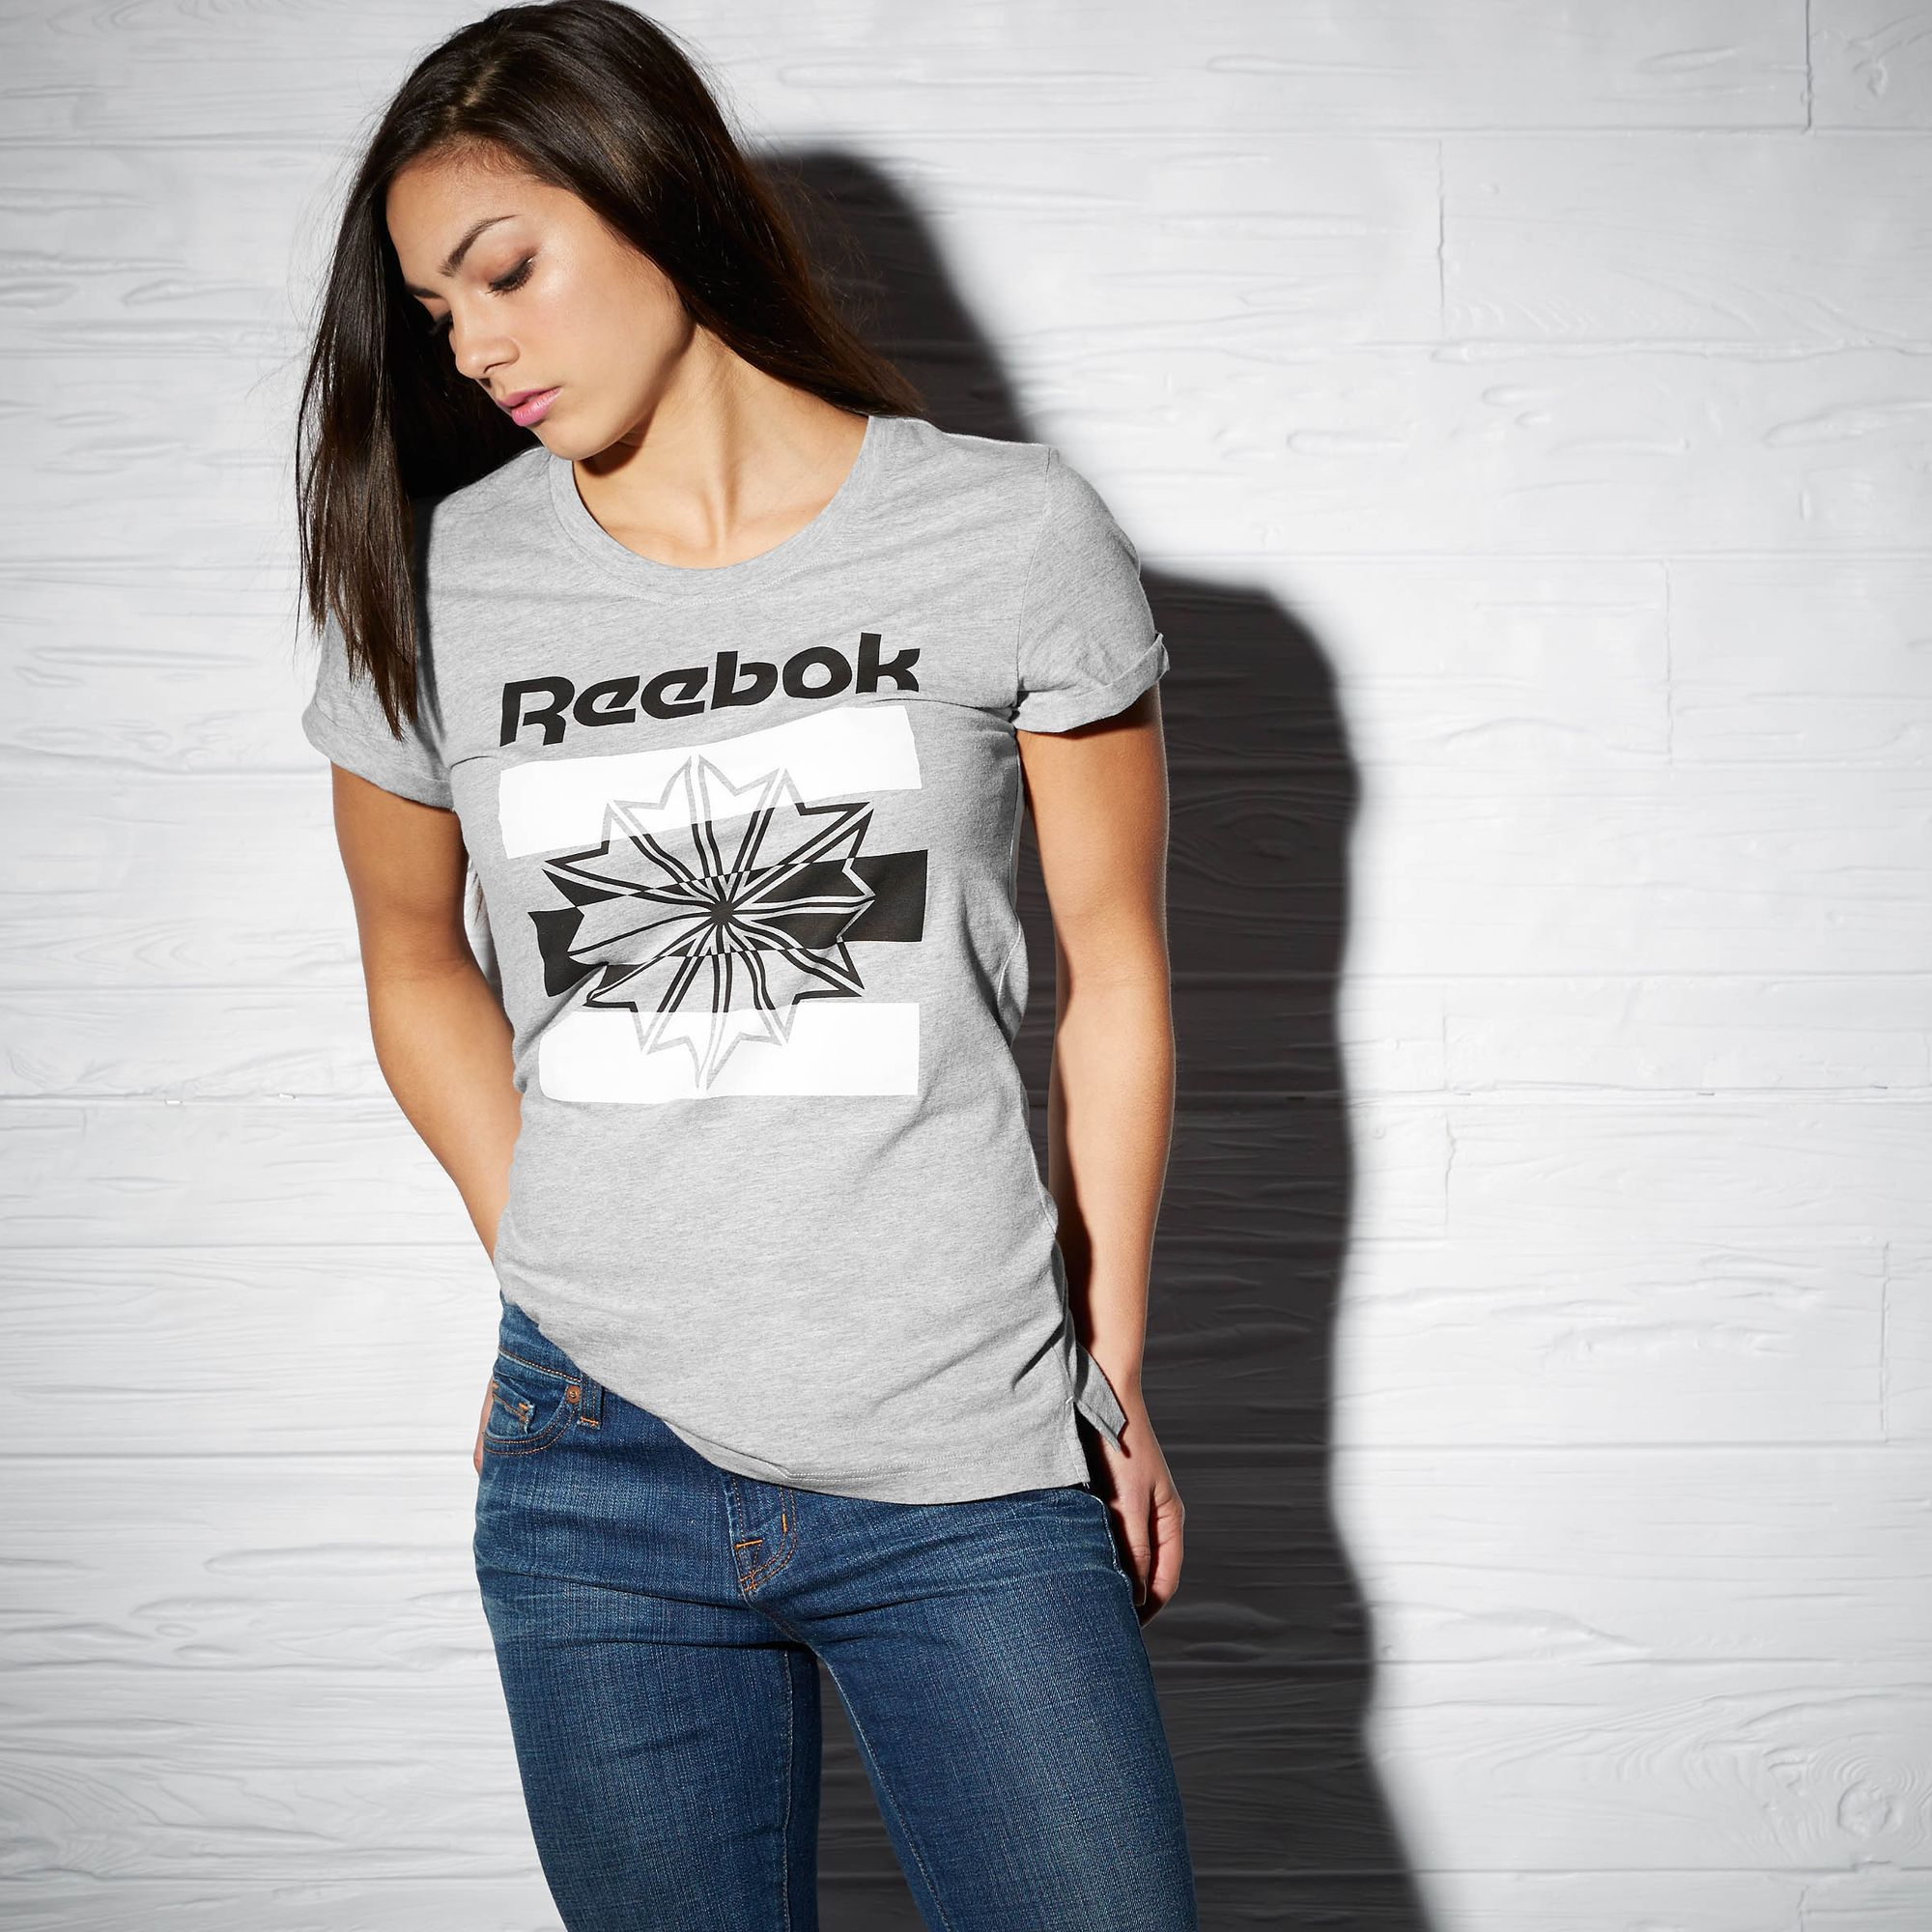 Camiseta Reebok Starcrestgris Reebok Classic Classic Mujer Camiseta Mujer Camiseta Reebok Classic Starcrestgris TK31clFJ